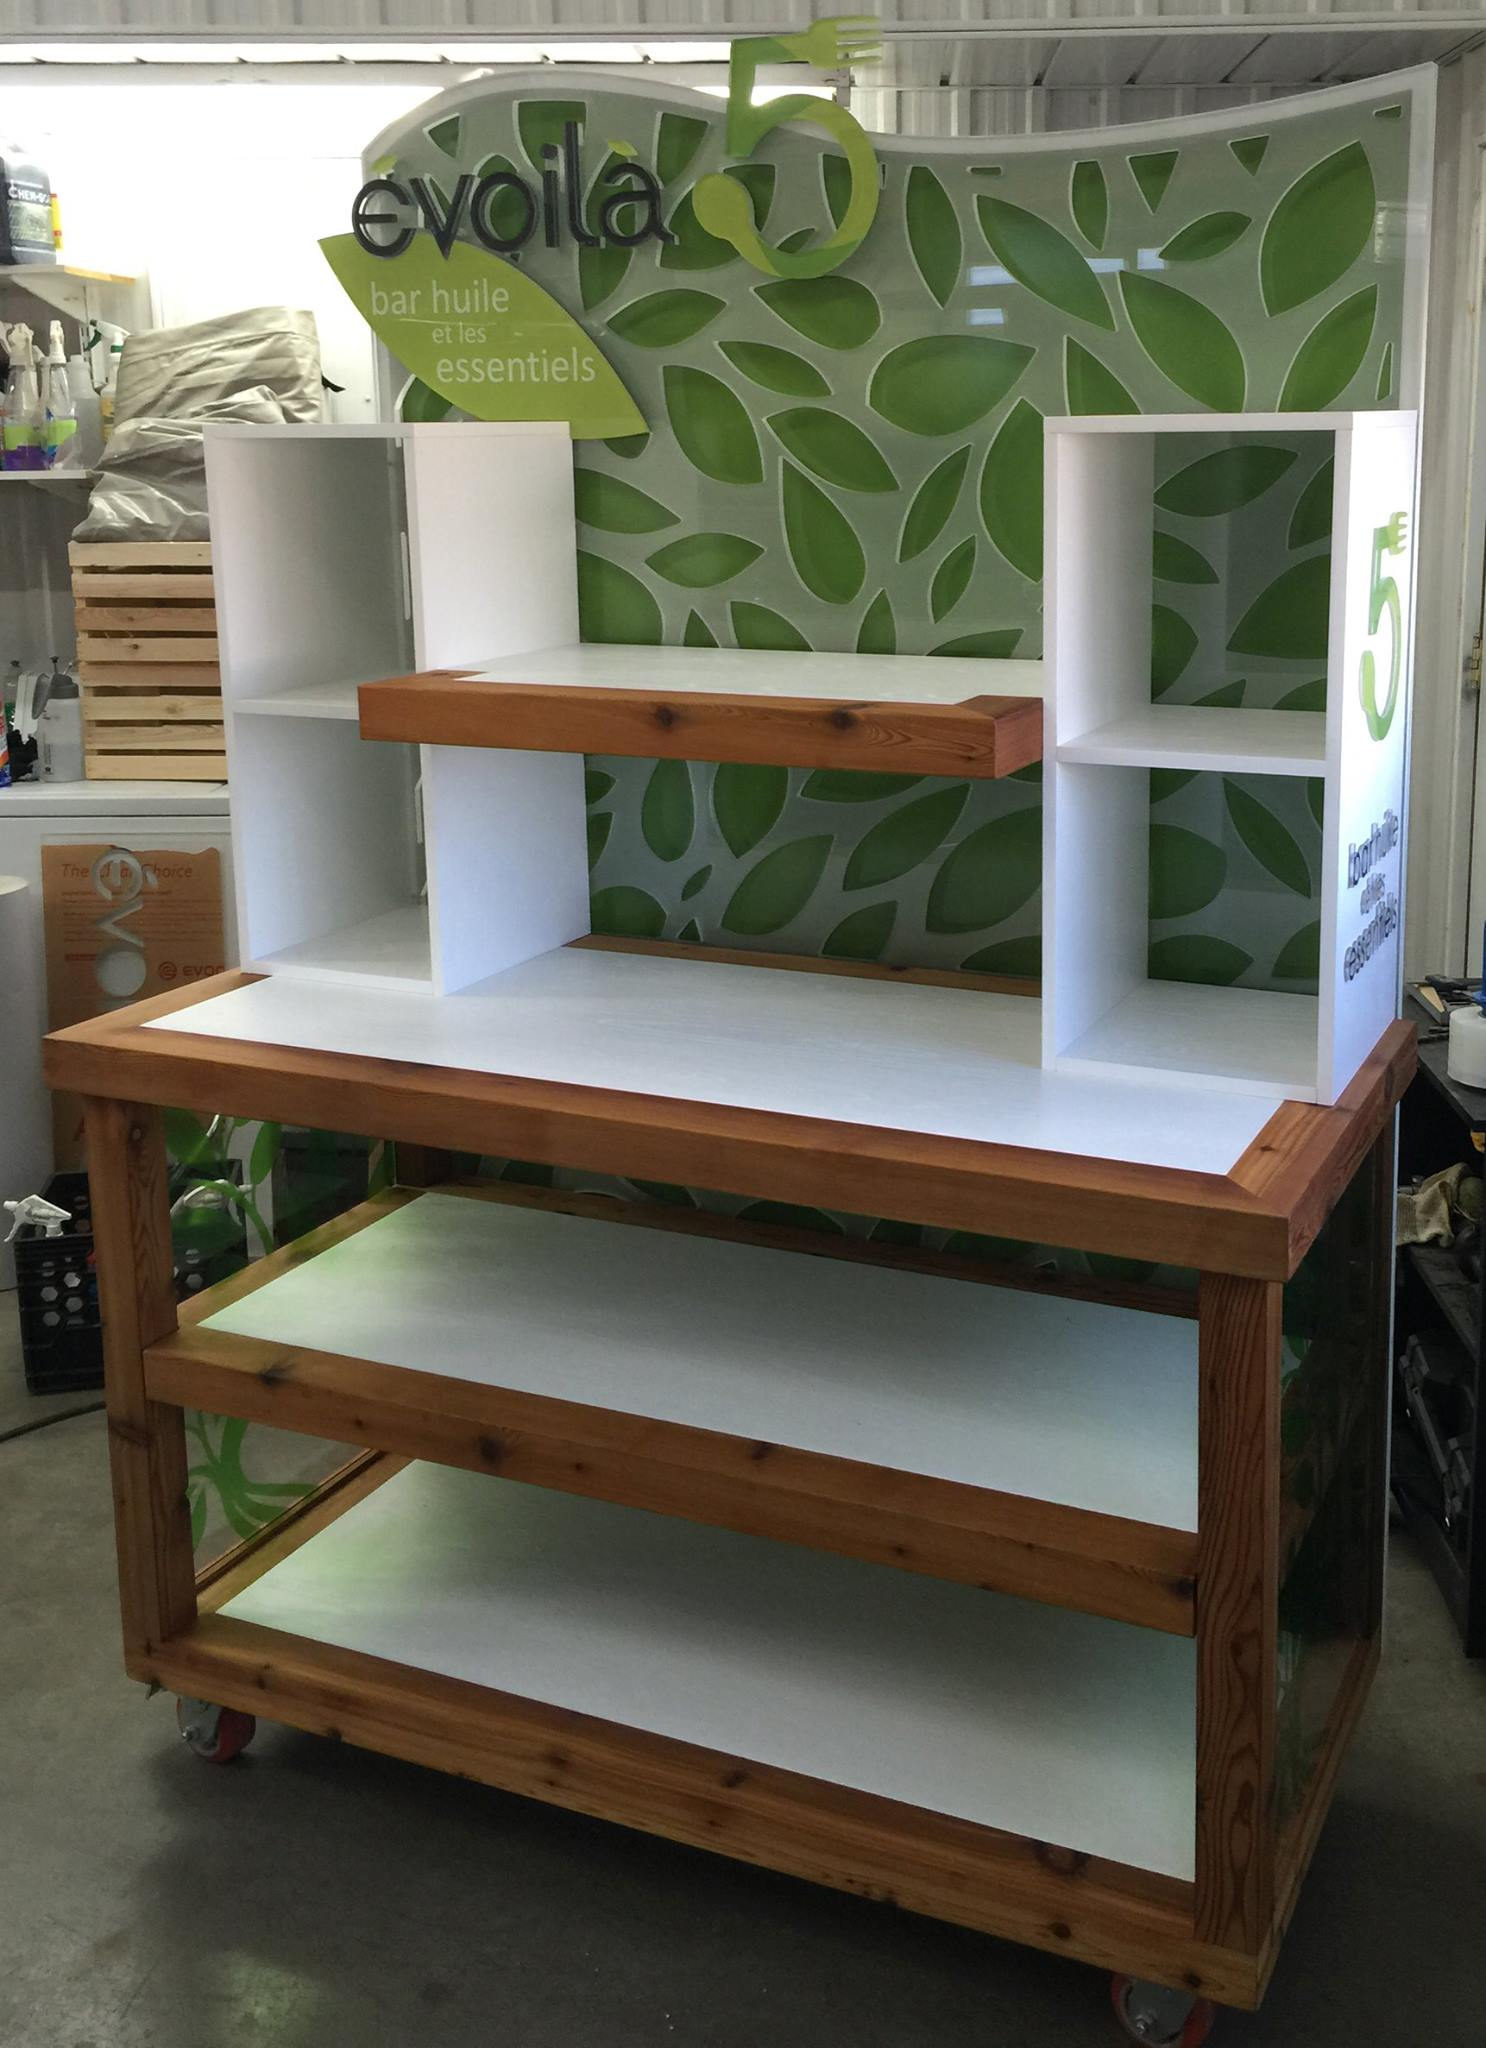 Habillage de meuble en acrylique